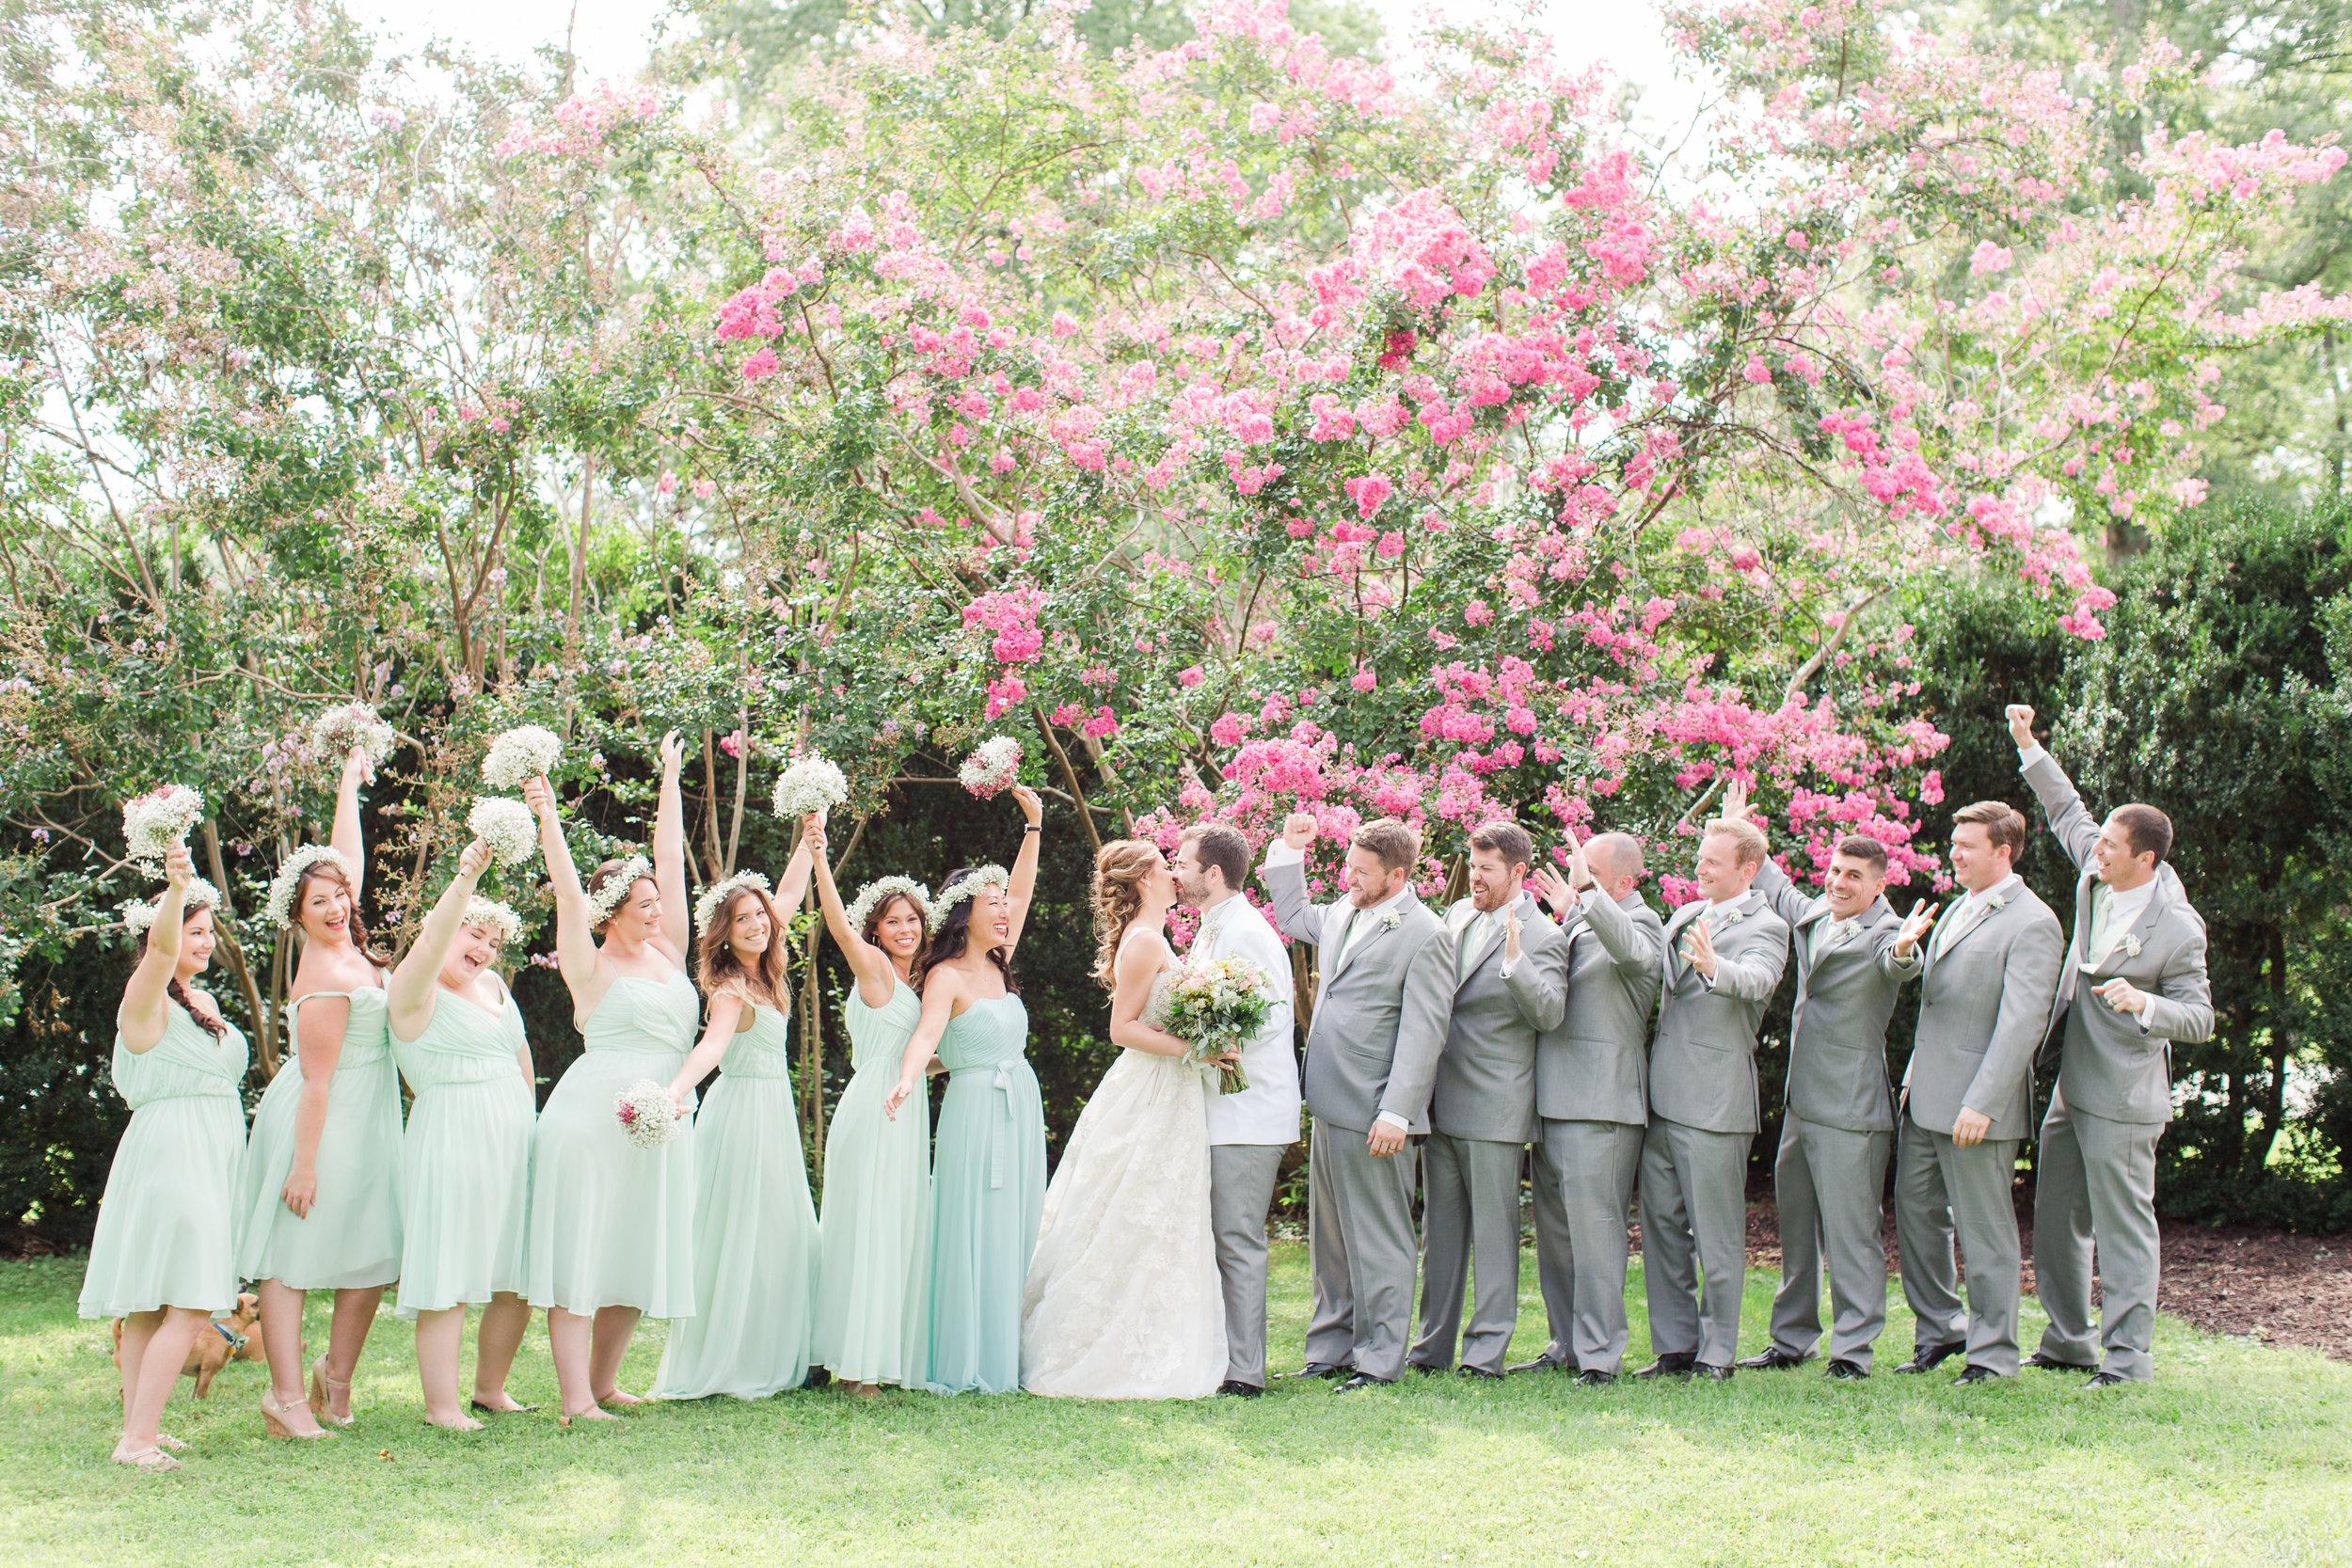 Mint Bridesmaid Dresses - West Virginia Wedding Photographer - Wedding Venue